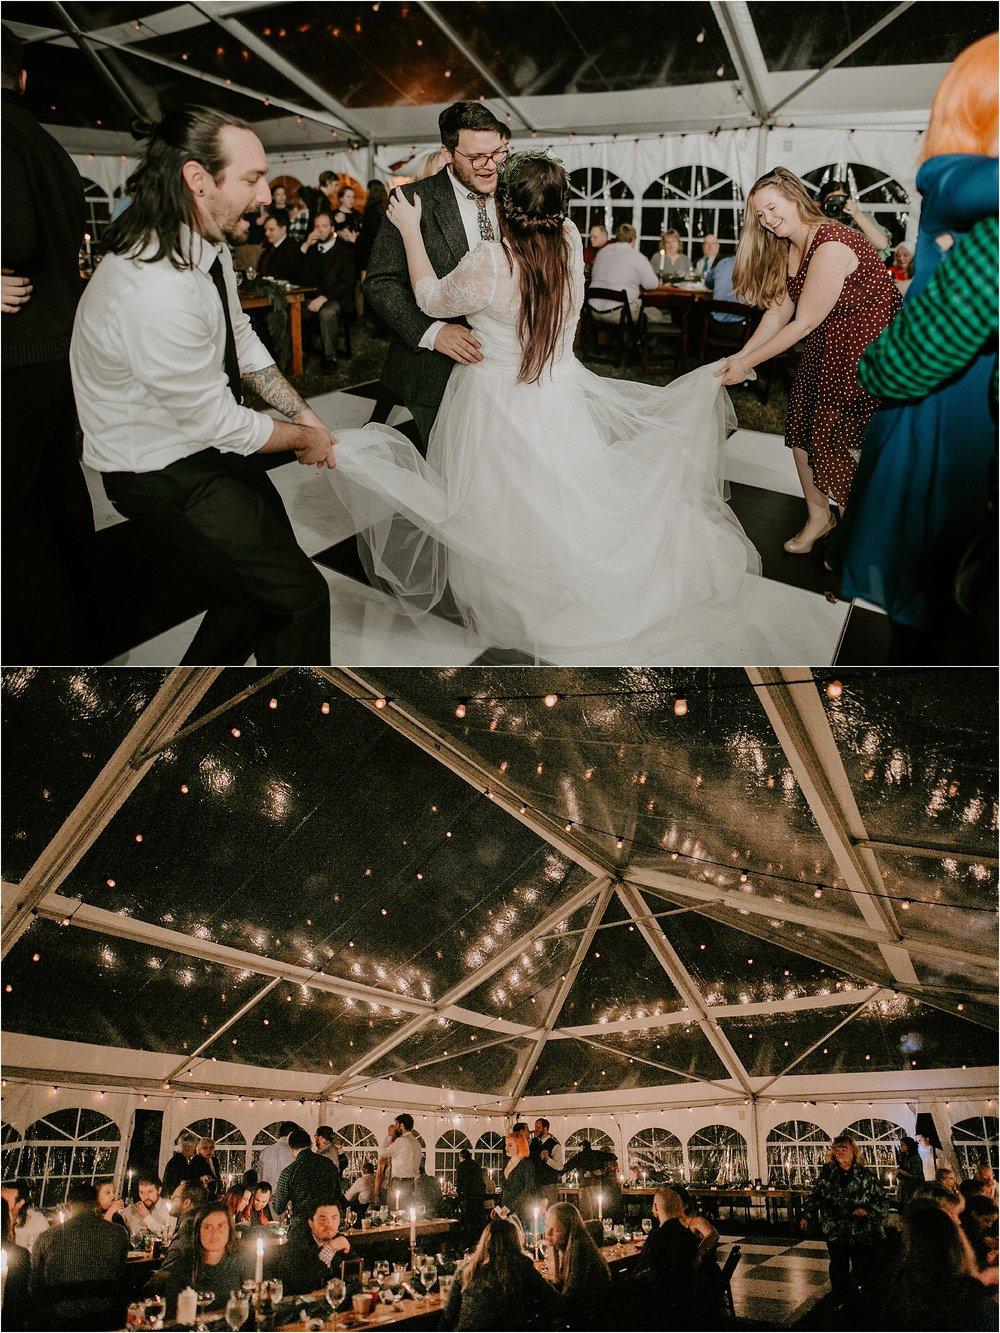 Sarah_Brookhart_Baltimore_Wedding_Photographer_0068.jpg